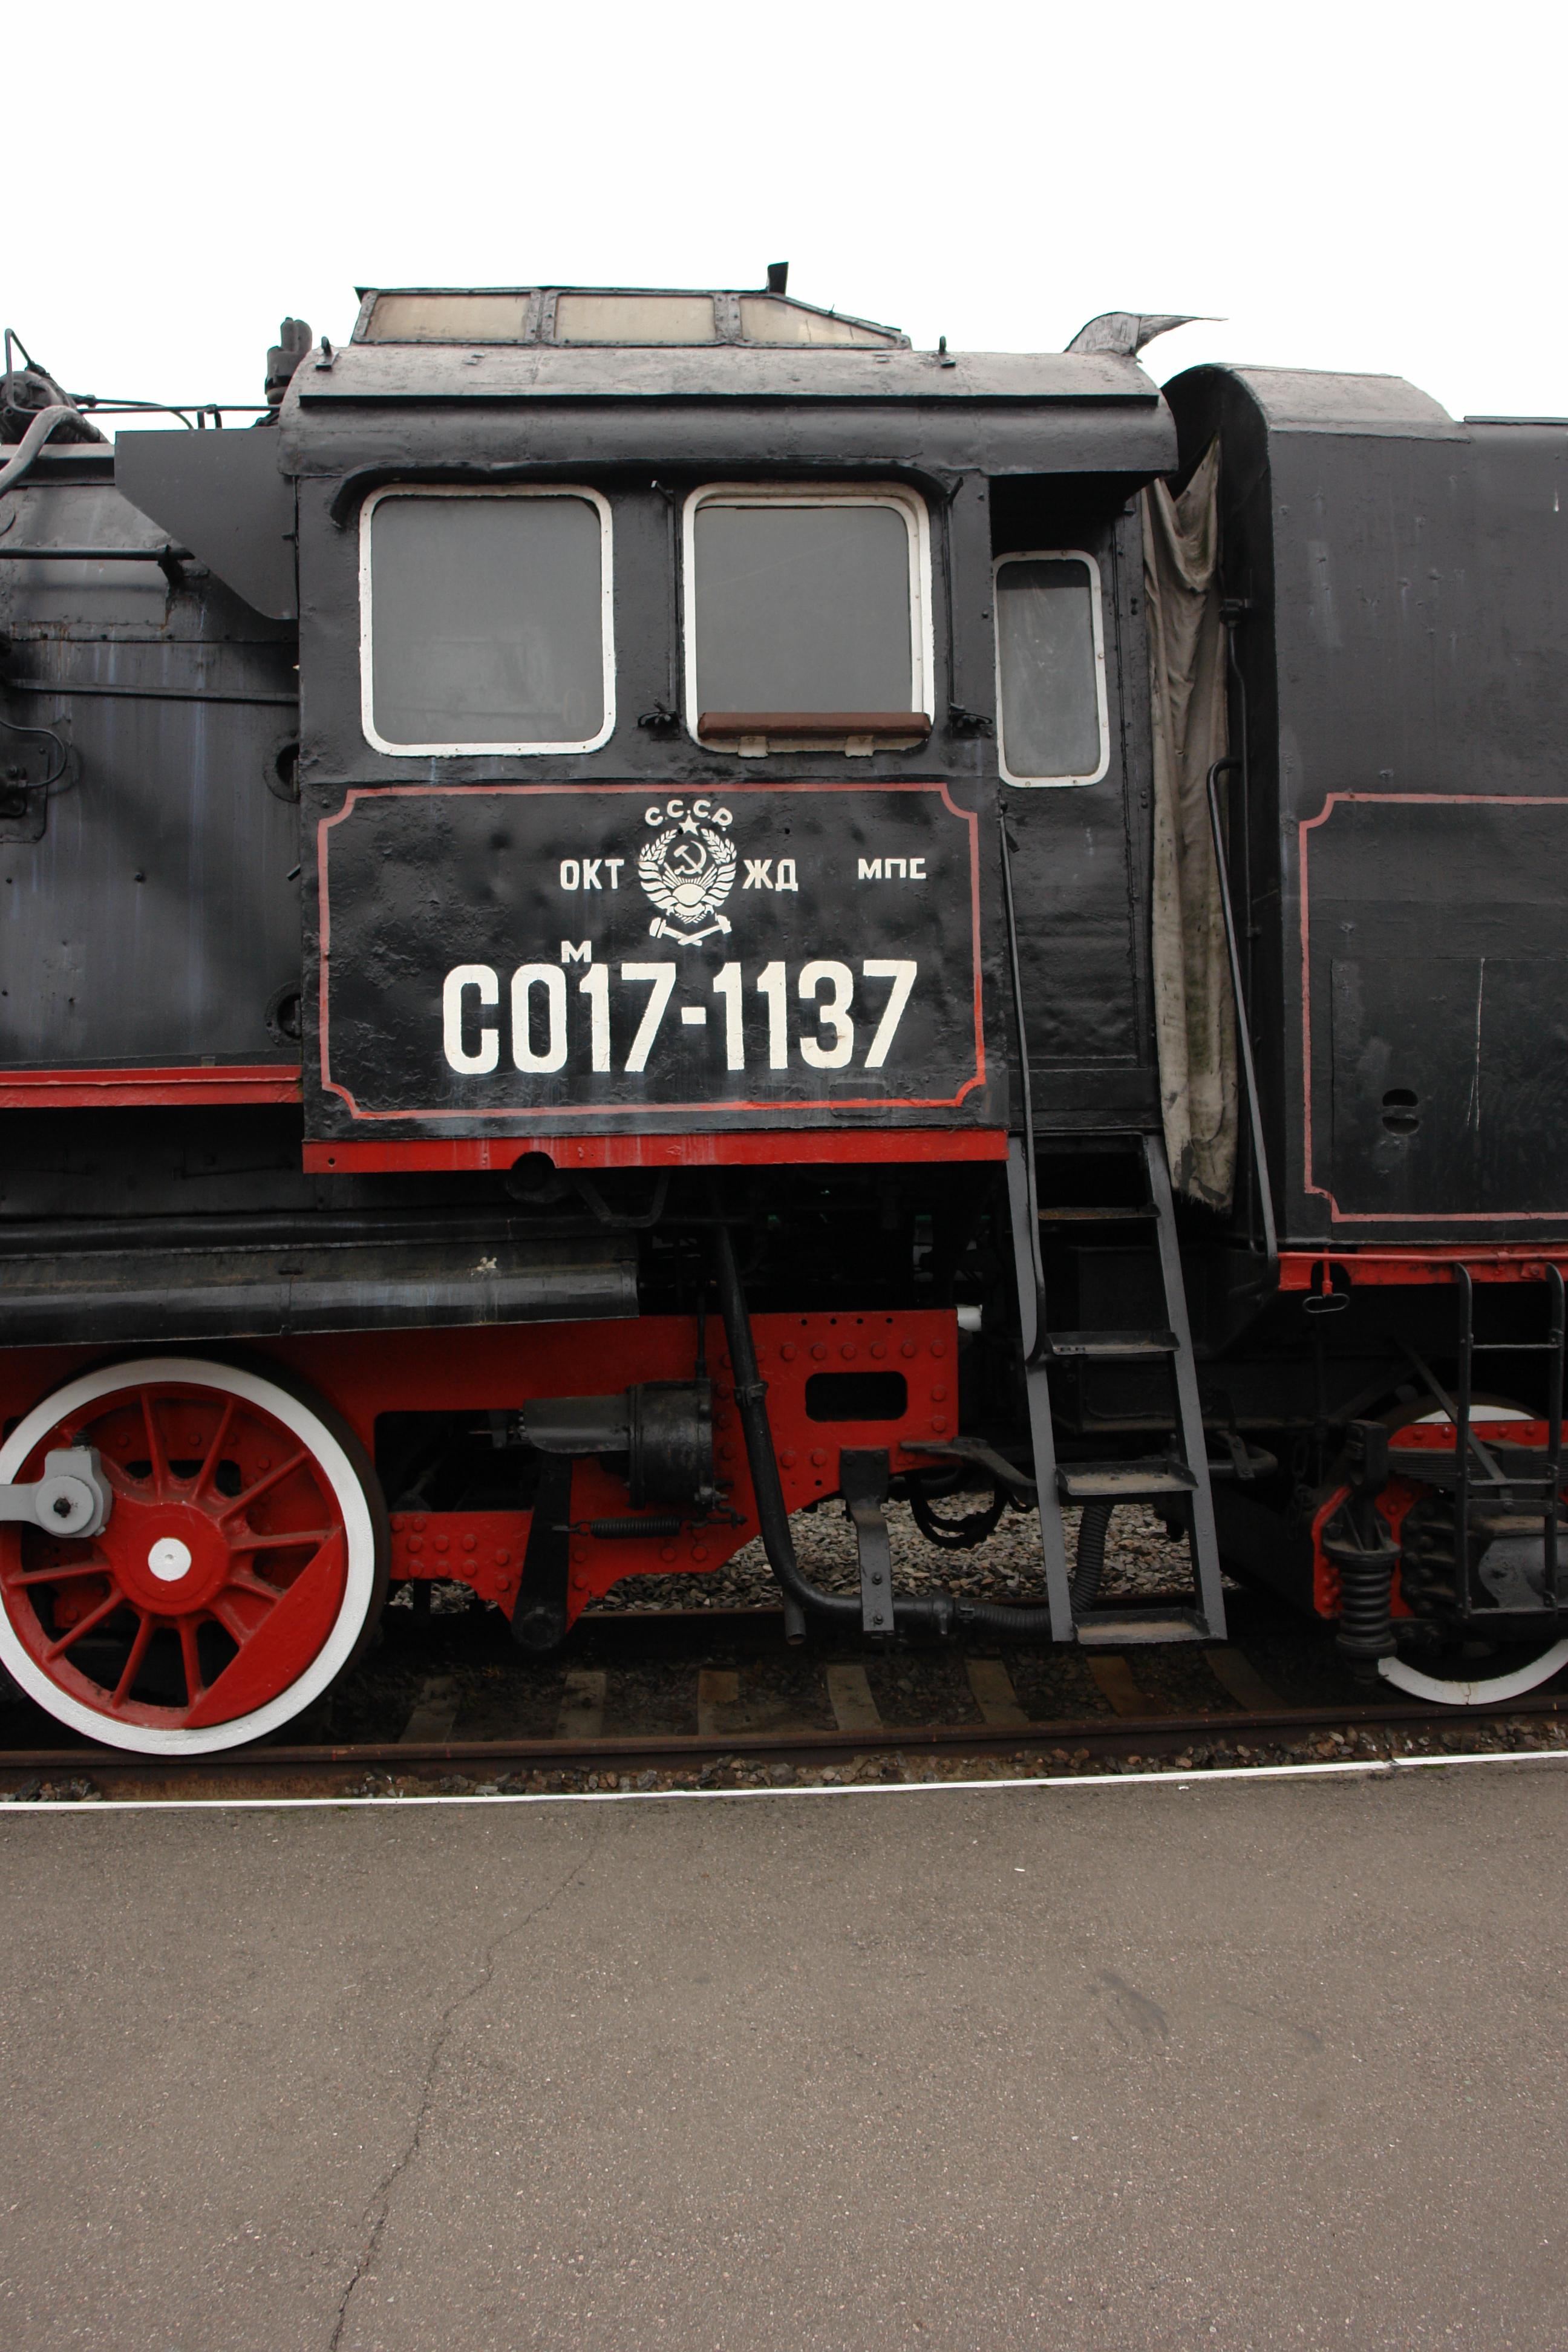 File:Паровоз CO17-1137 (9).jpg